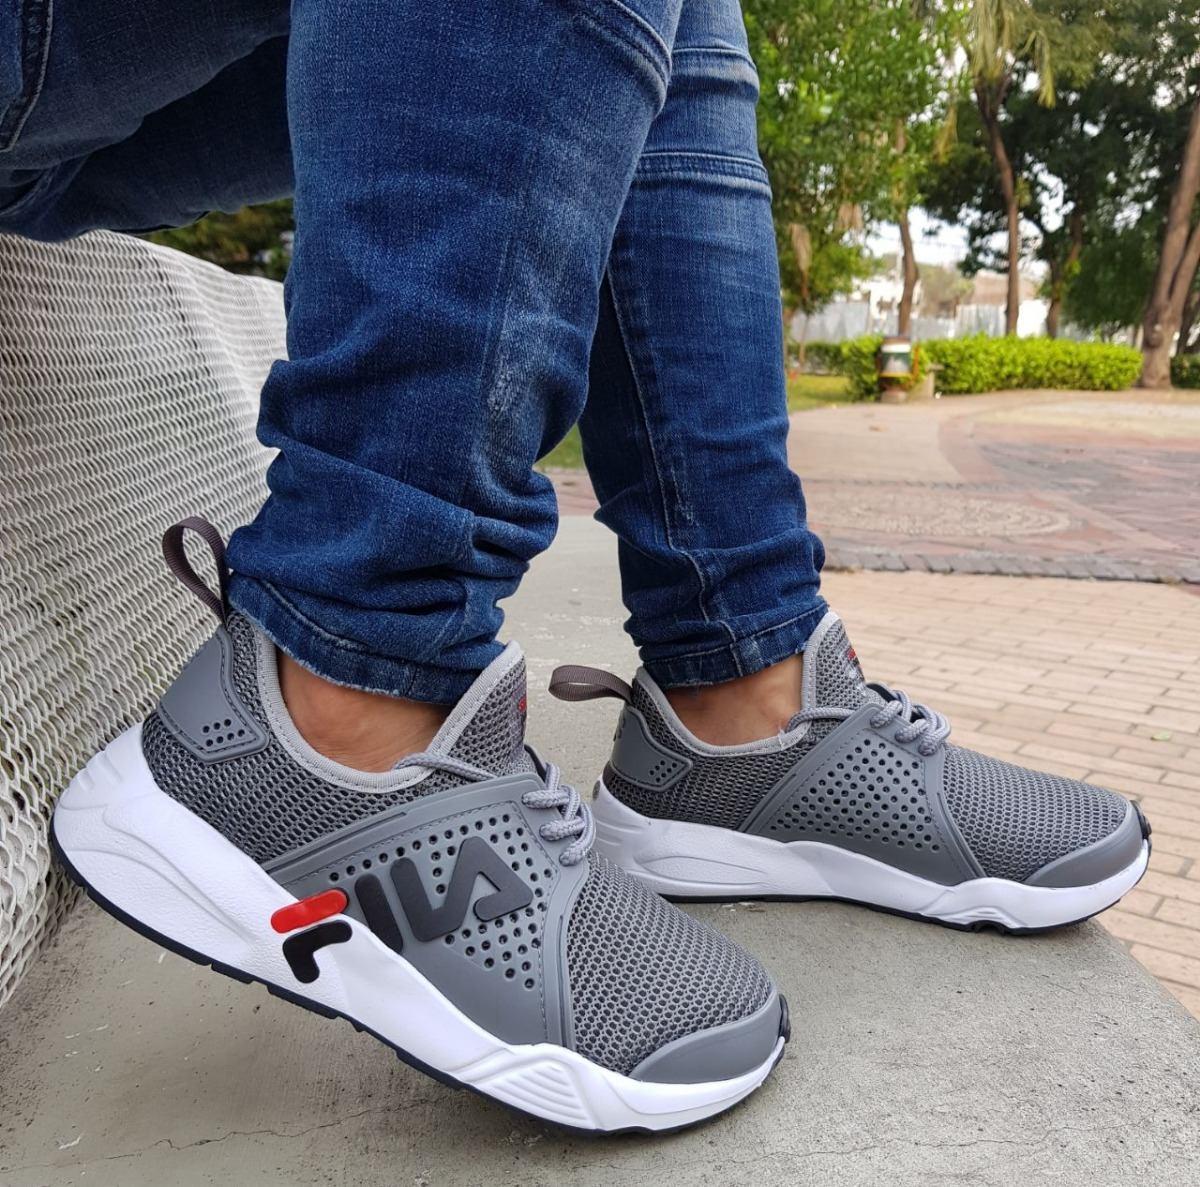 Tenis Fila Zapatos Deportivos Hombre Calzado Fila